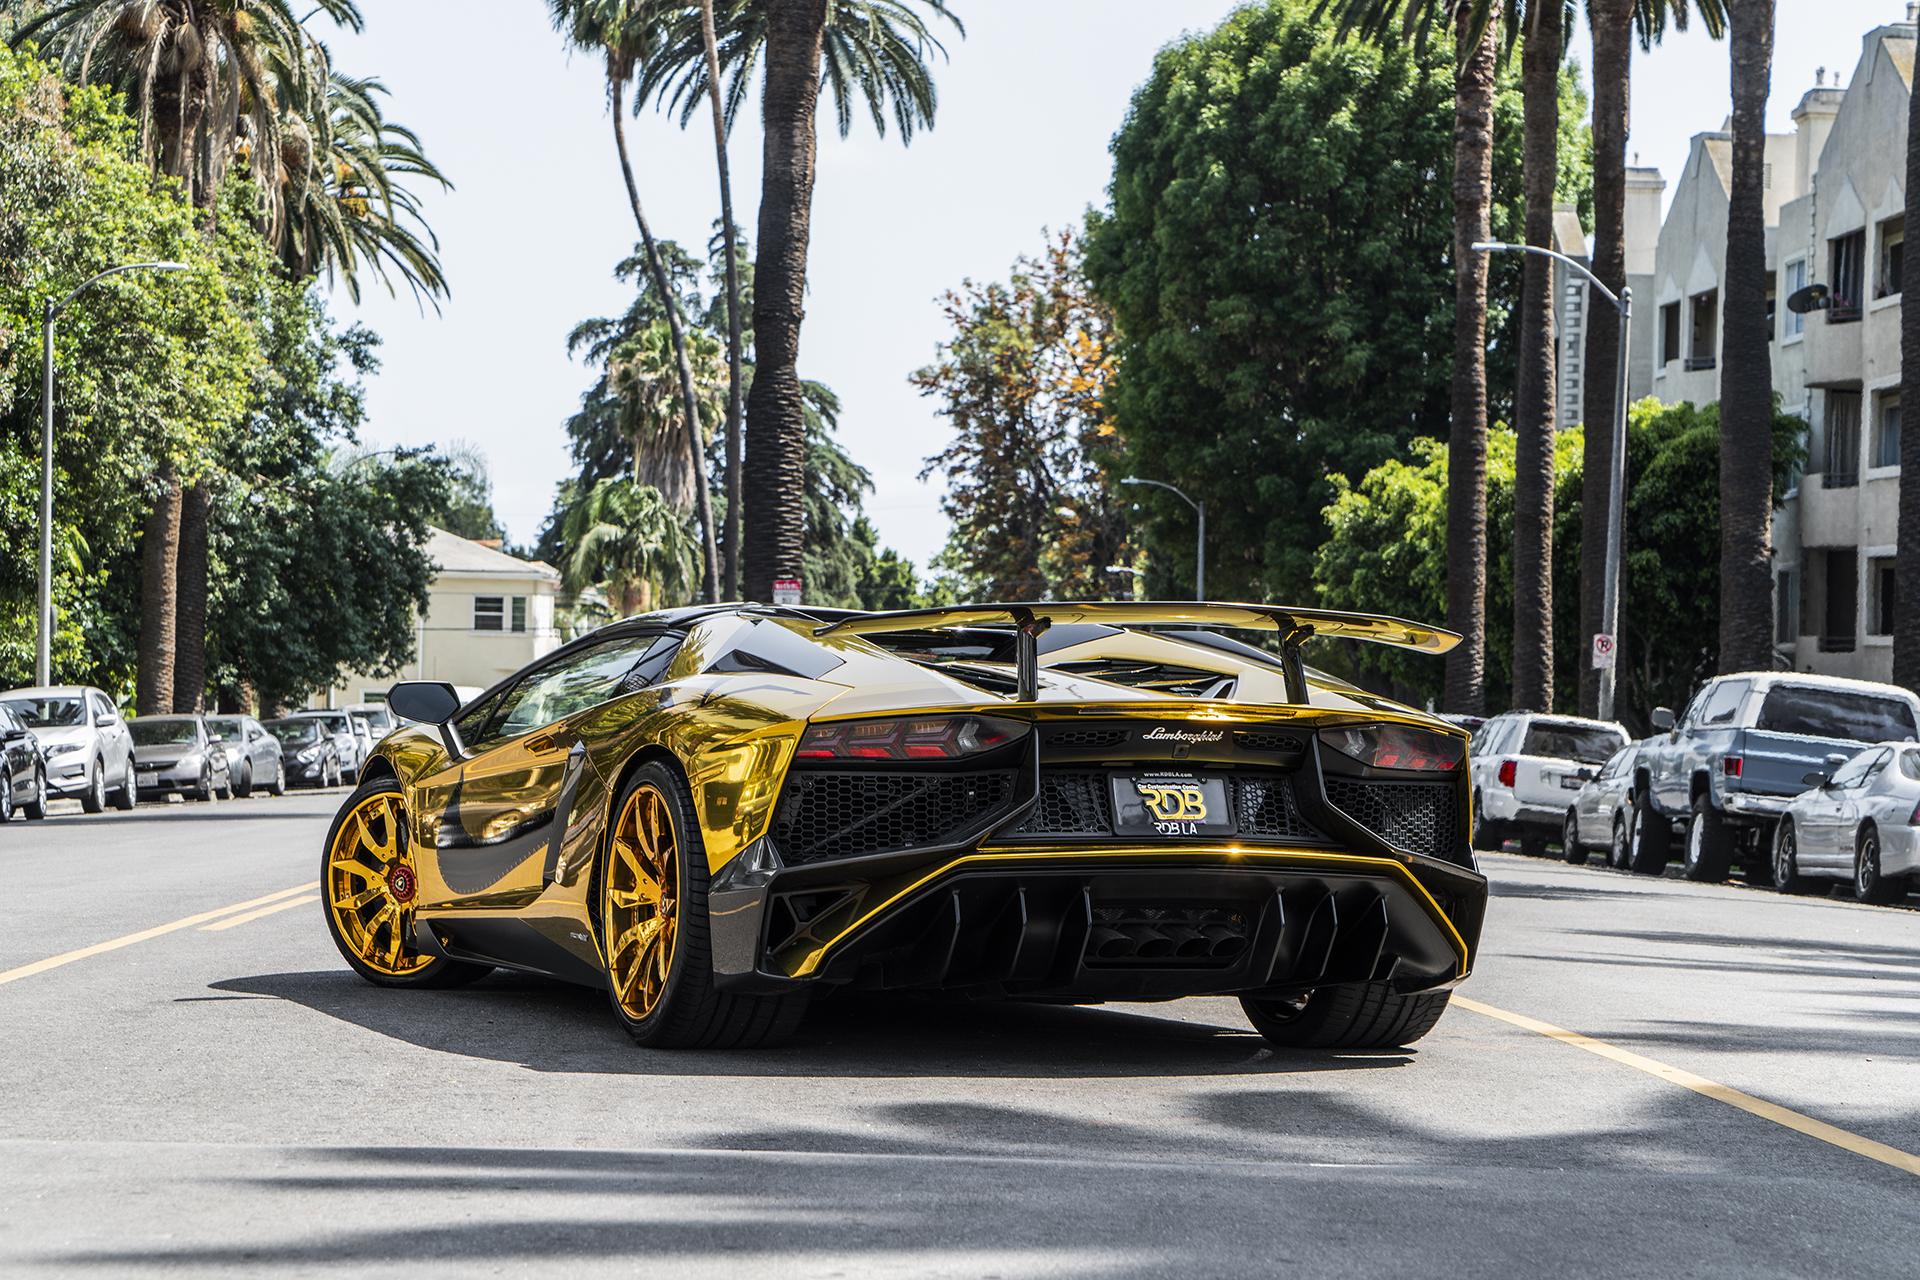 Chris Brown S Gold Lamborghini Aventador Sv Roadster On Forgiato Wheels